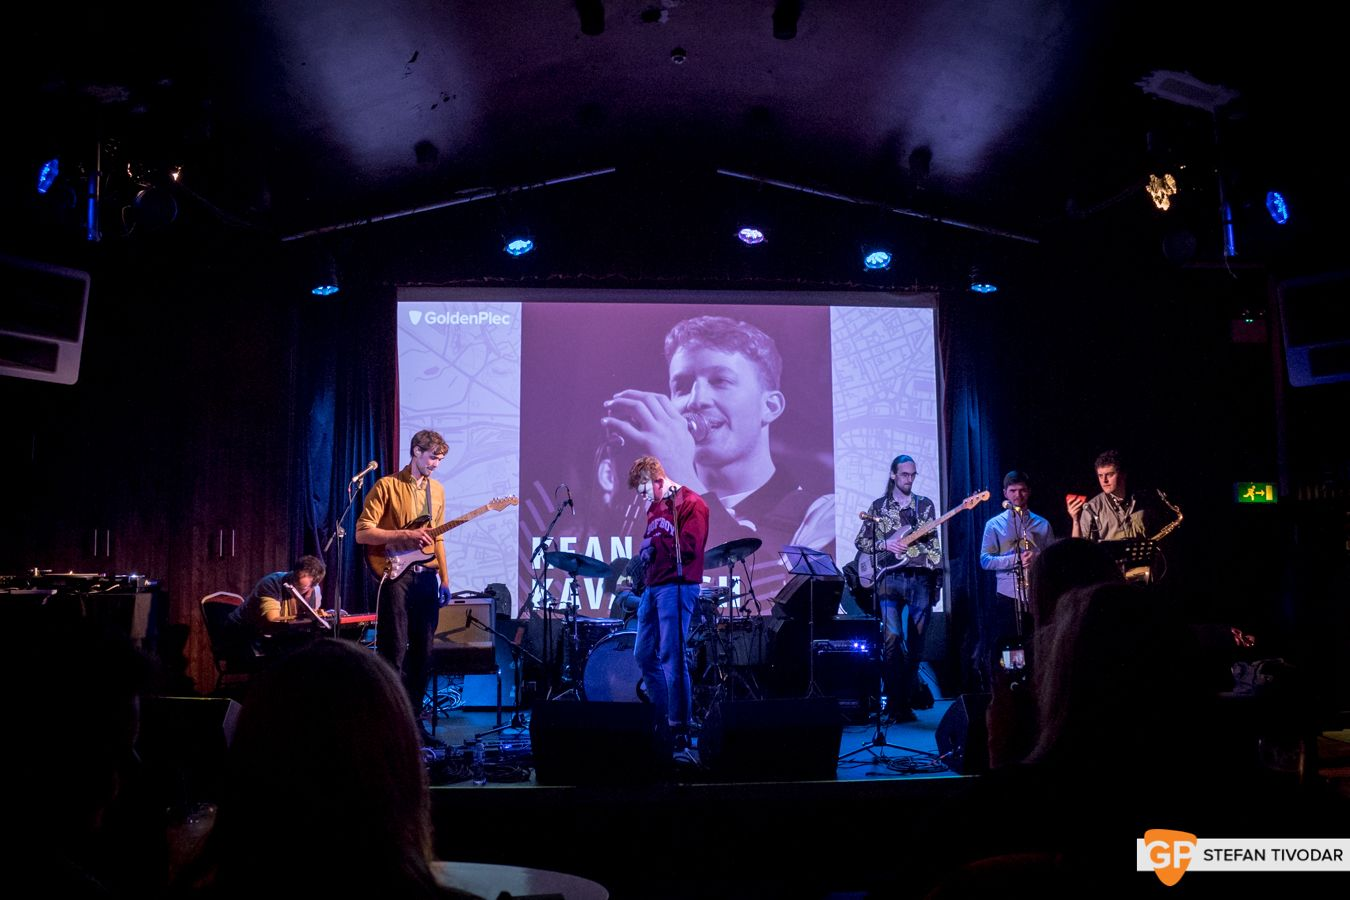 Kean Kavanagh GoldenPlec Bloc Party Jam 2018 Sugar Club 3